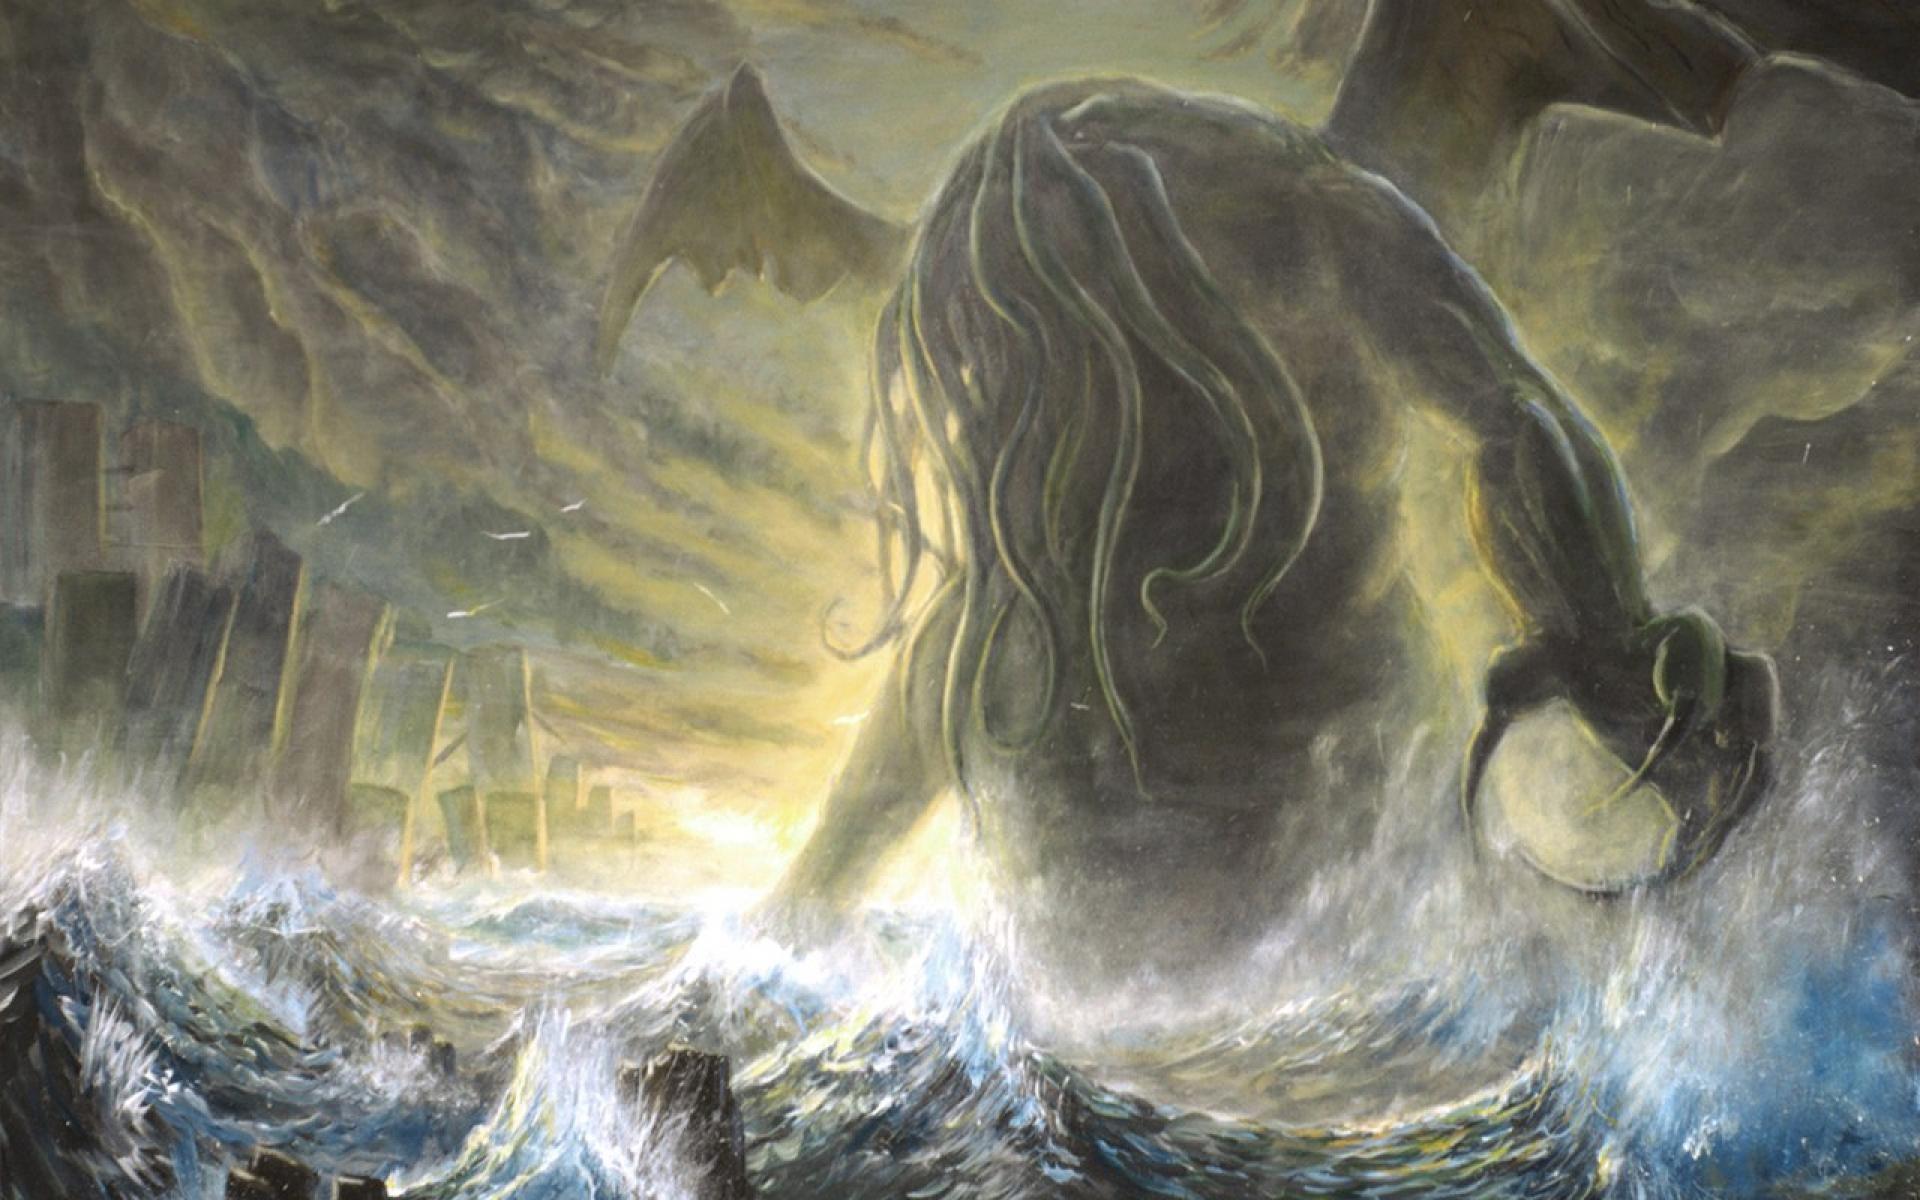 … Cthulhu Lovecraft